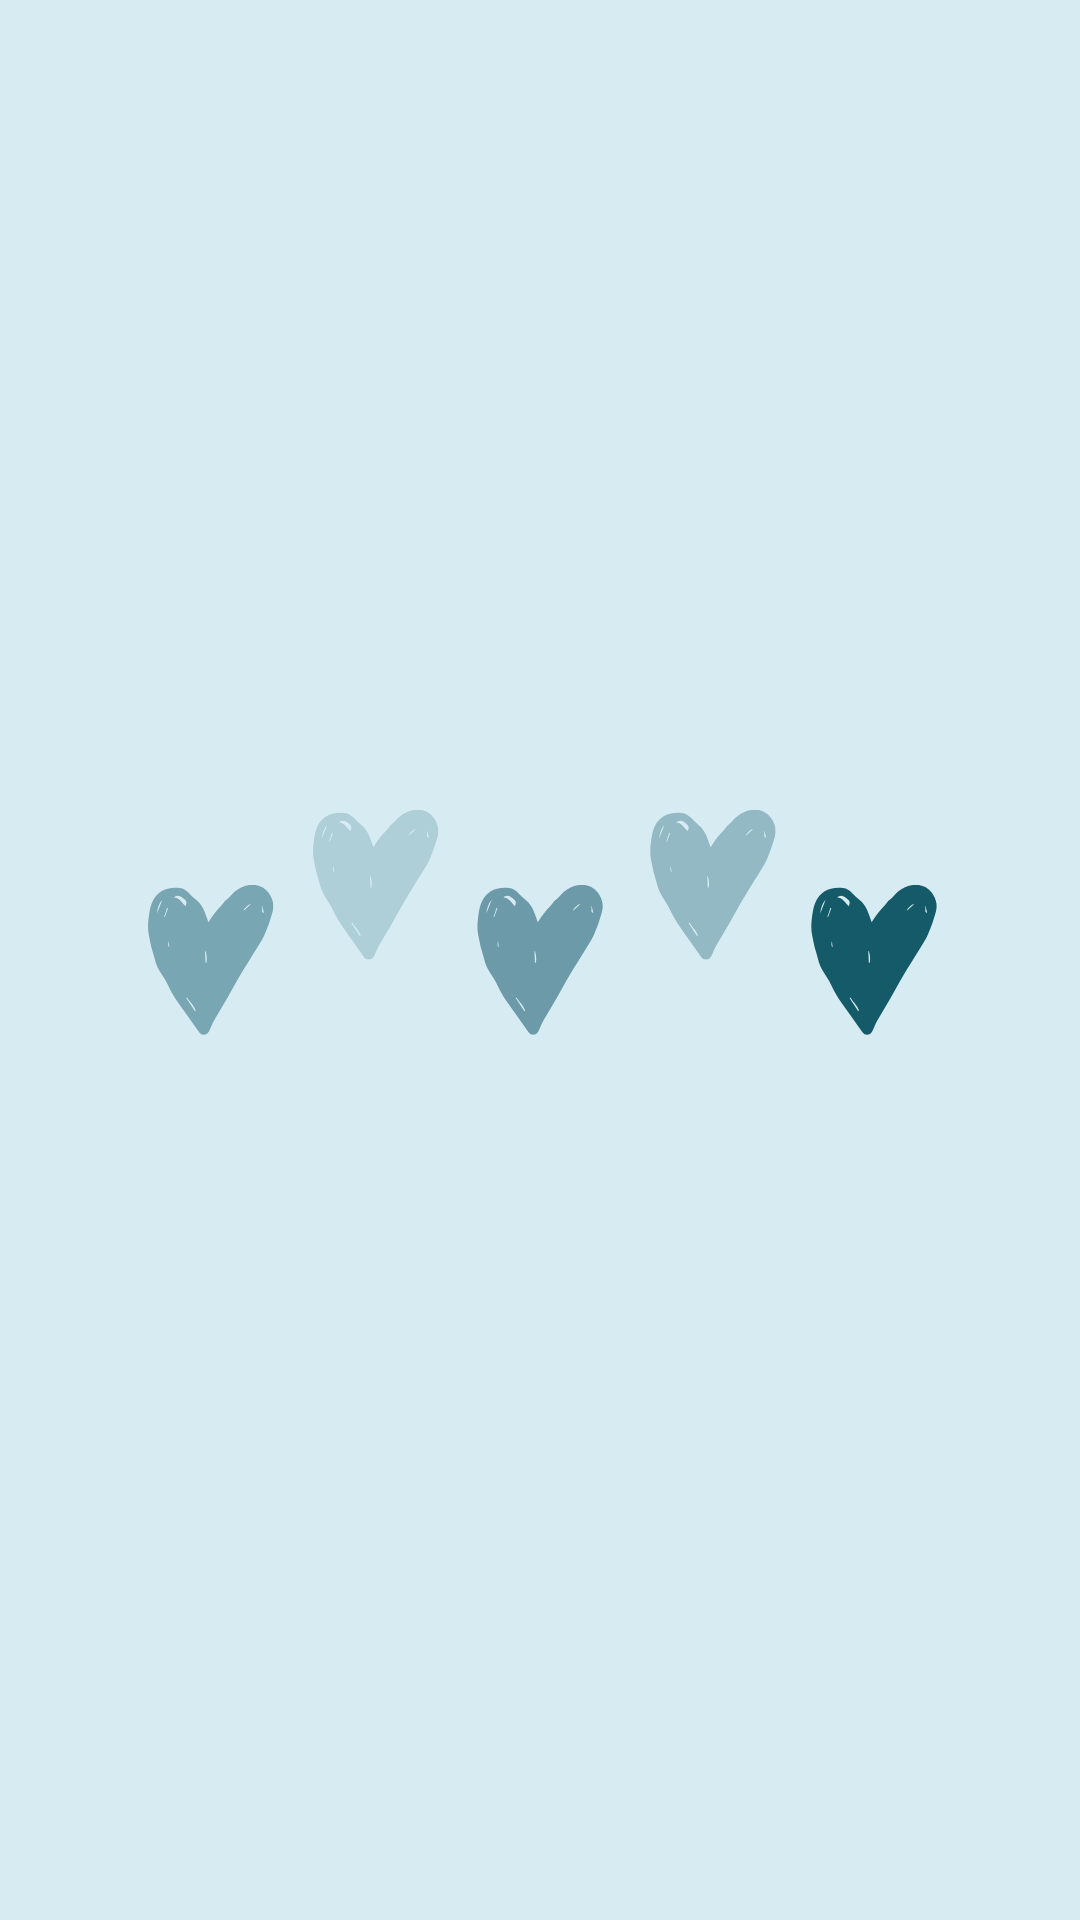 Blue Aesthetic Wallpaper In 2020 Iphone Wallpaper Tumblr Aesthetic Blue Wallpaper Iphone Blue Aesthetic Pastel